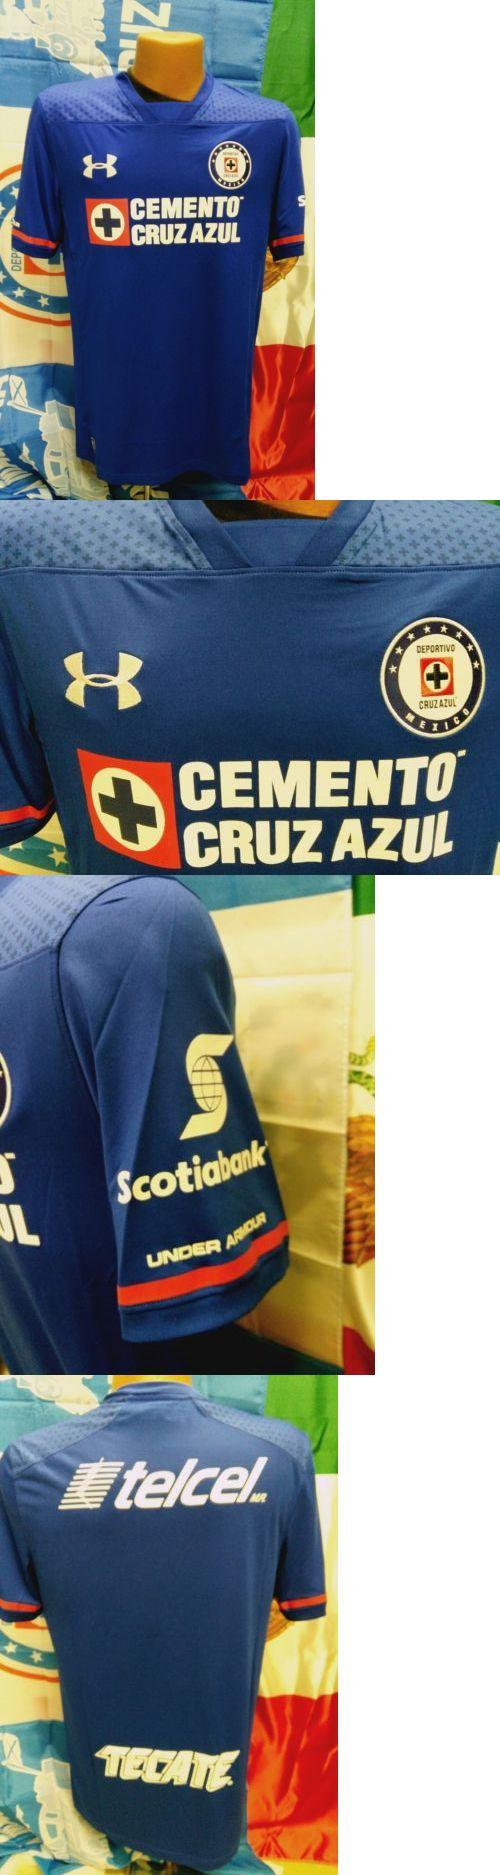 Soccer-International Clubs 2887: Club Deportivo Cruz Azul Under Armour Jersey 2017 18 -> BUY IT NOW ONLY: $90 on eBay!